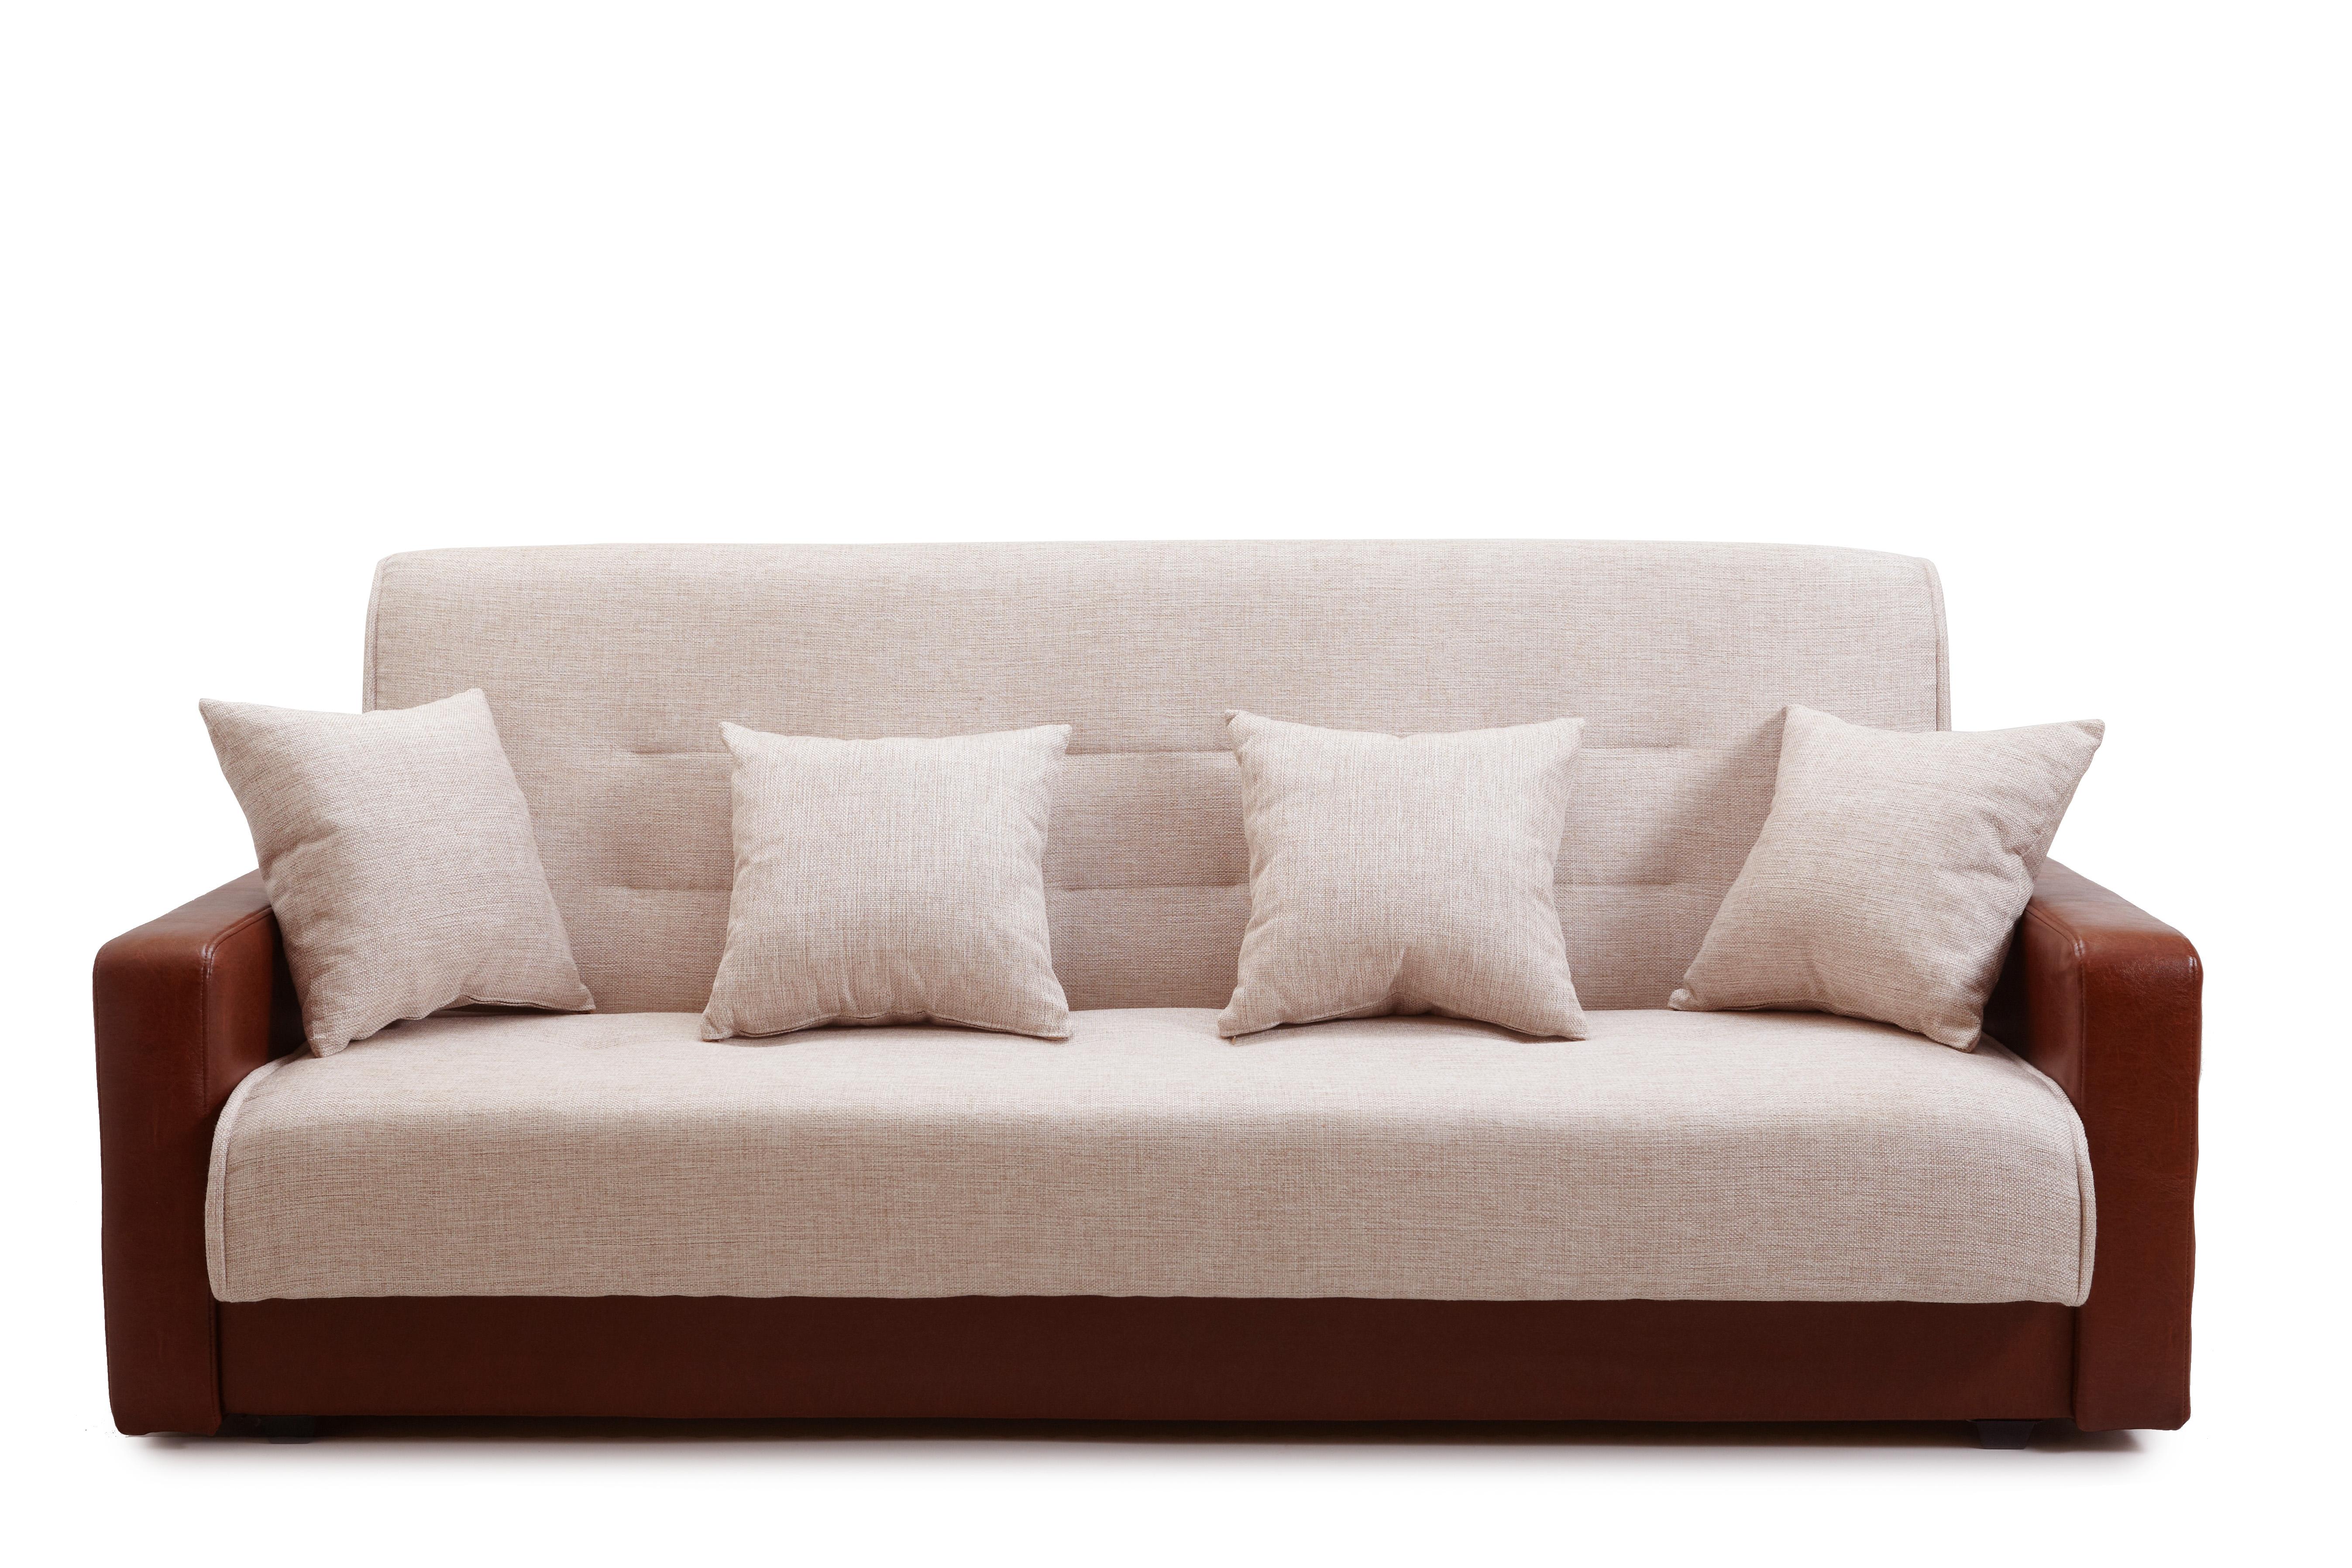 Прямой диван Лира (с 2-мя подушками) фото